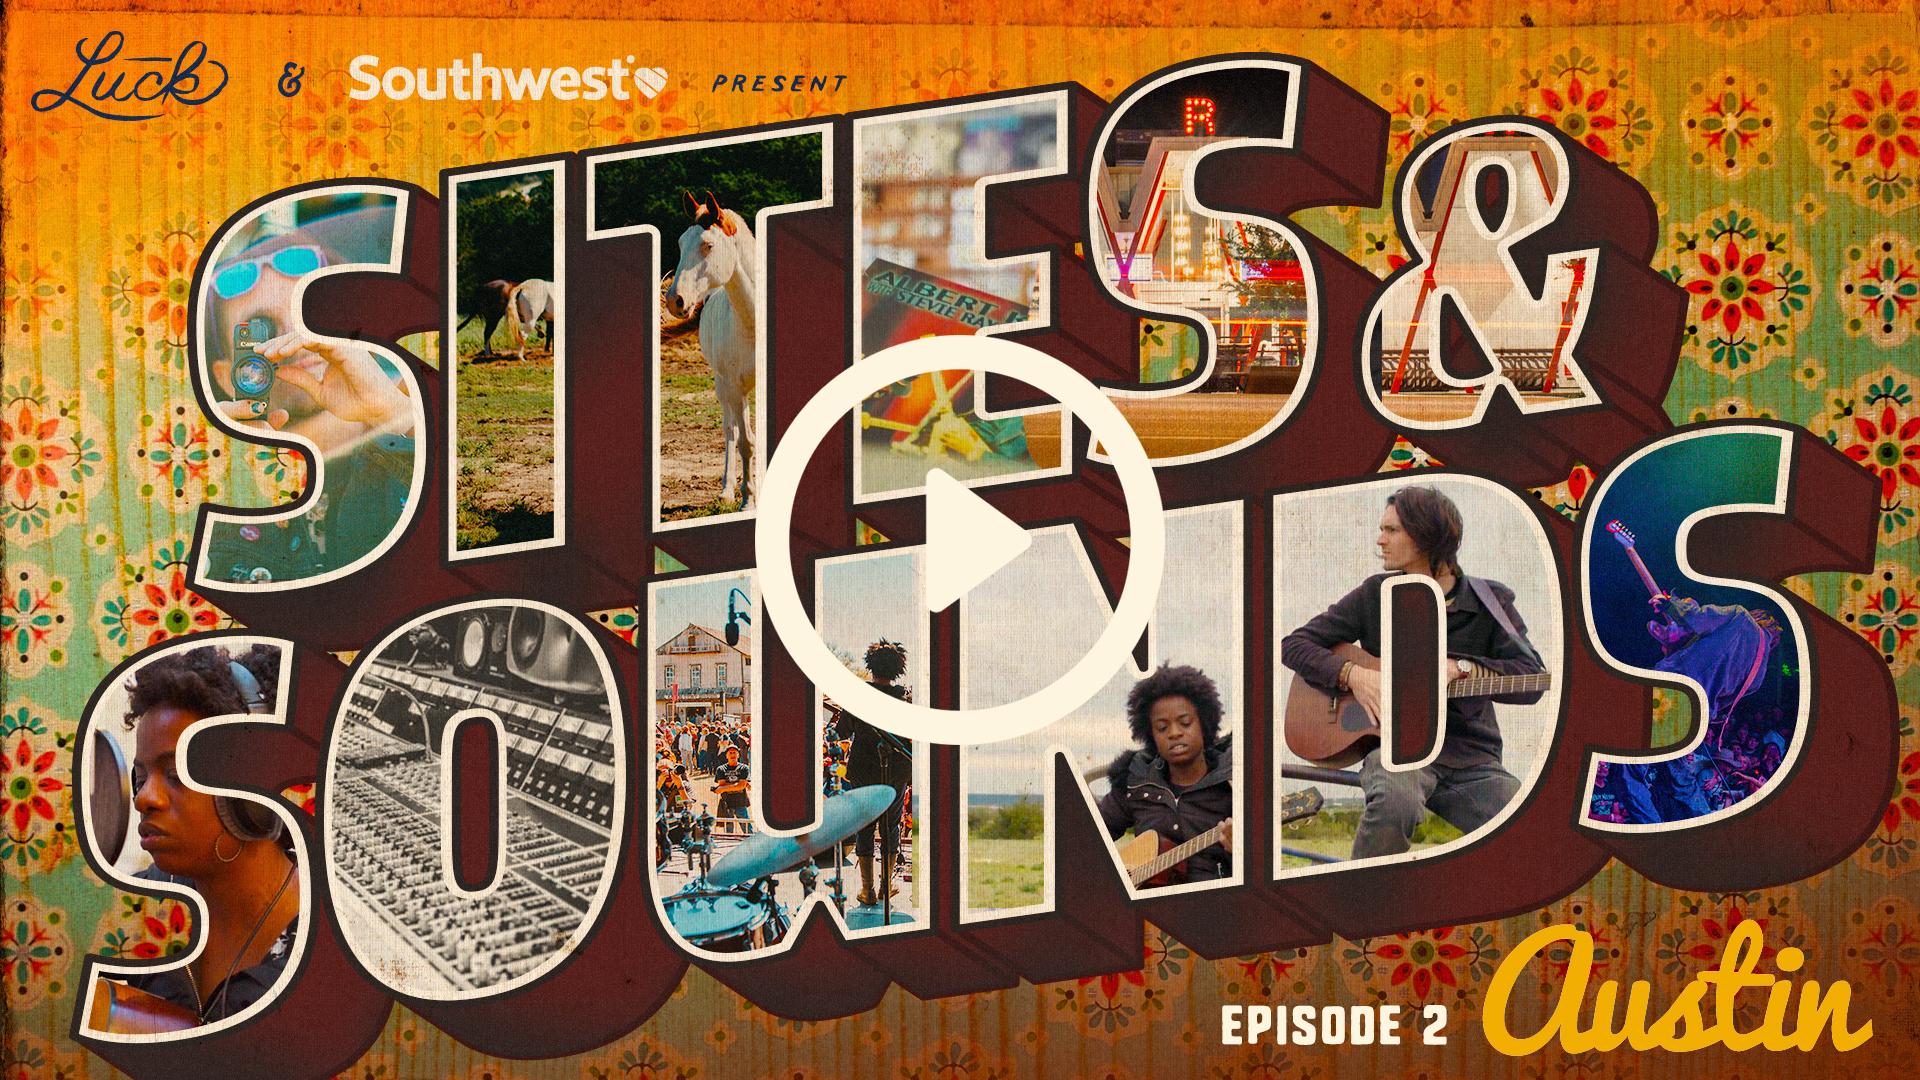 SS_Austin_Postcard_02_Play.jpg